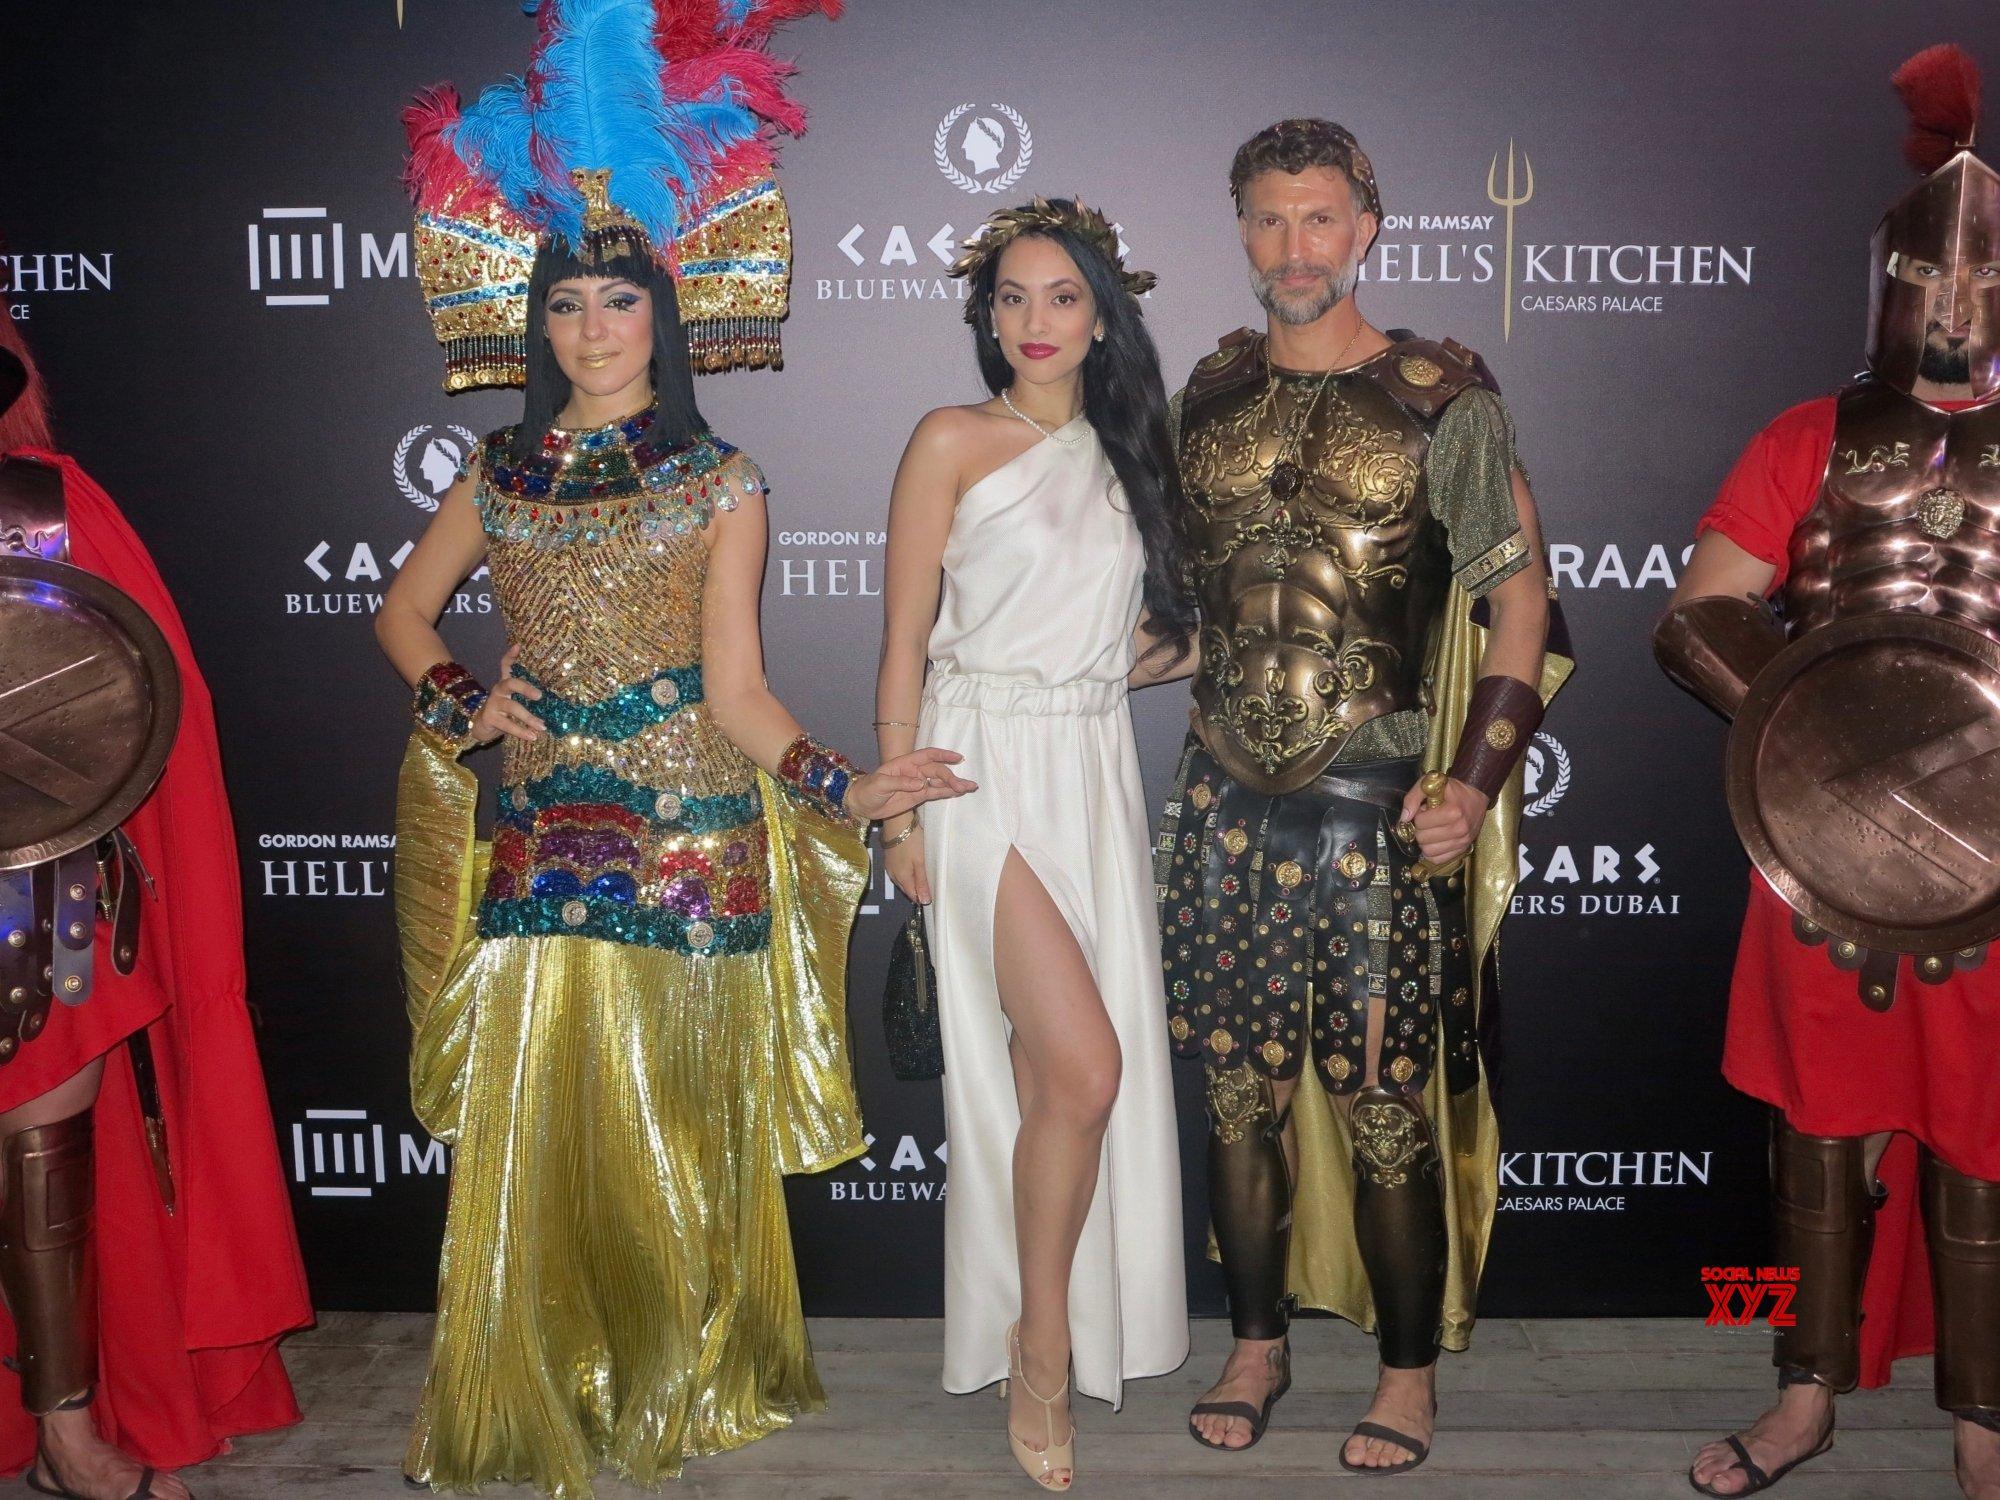 Dubai: Inauguration of Caesars Bluewaters Dubai #Gallery